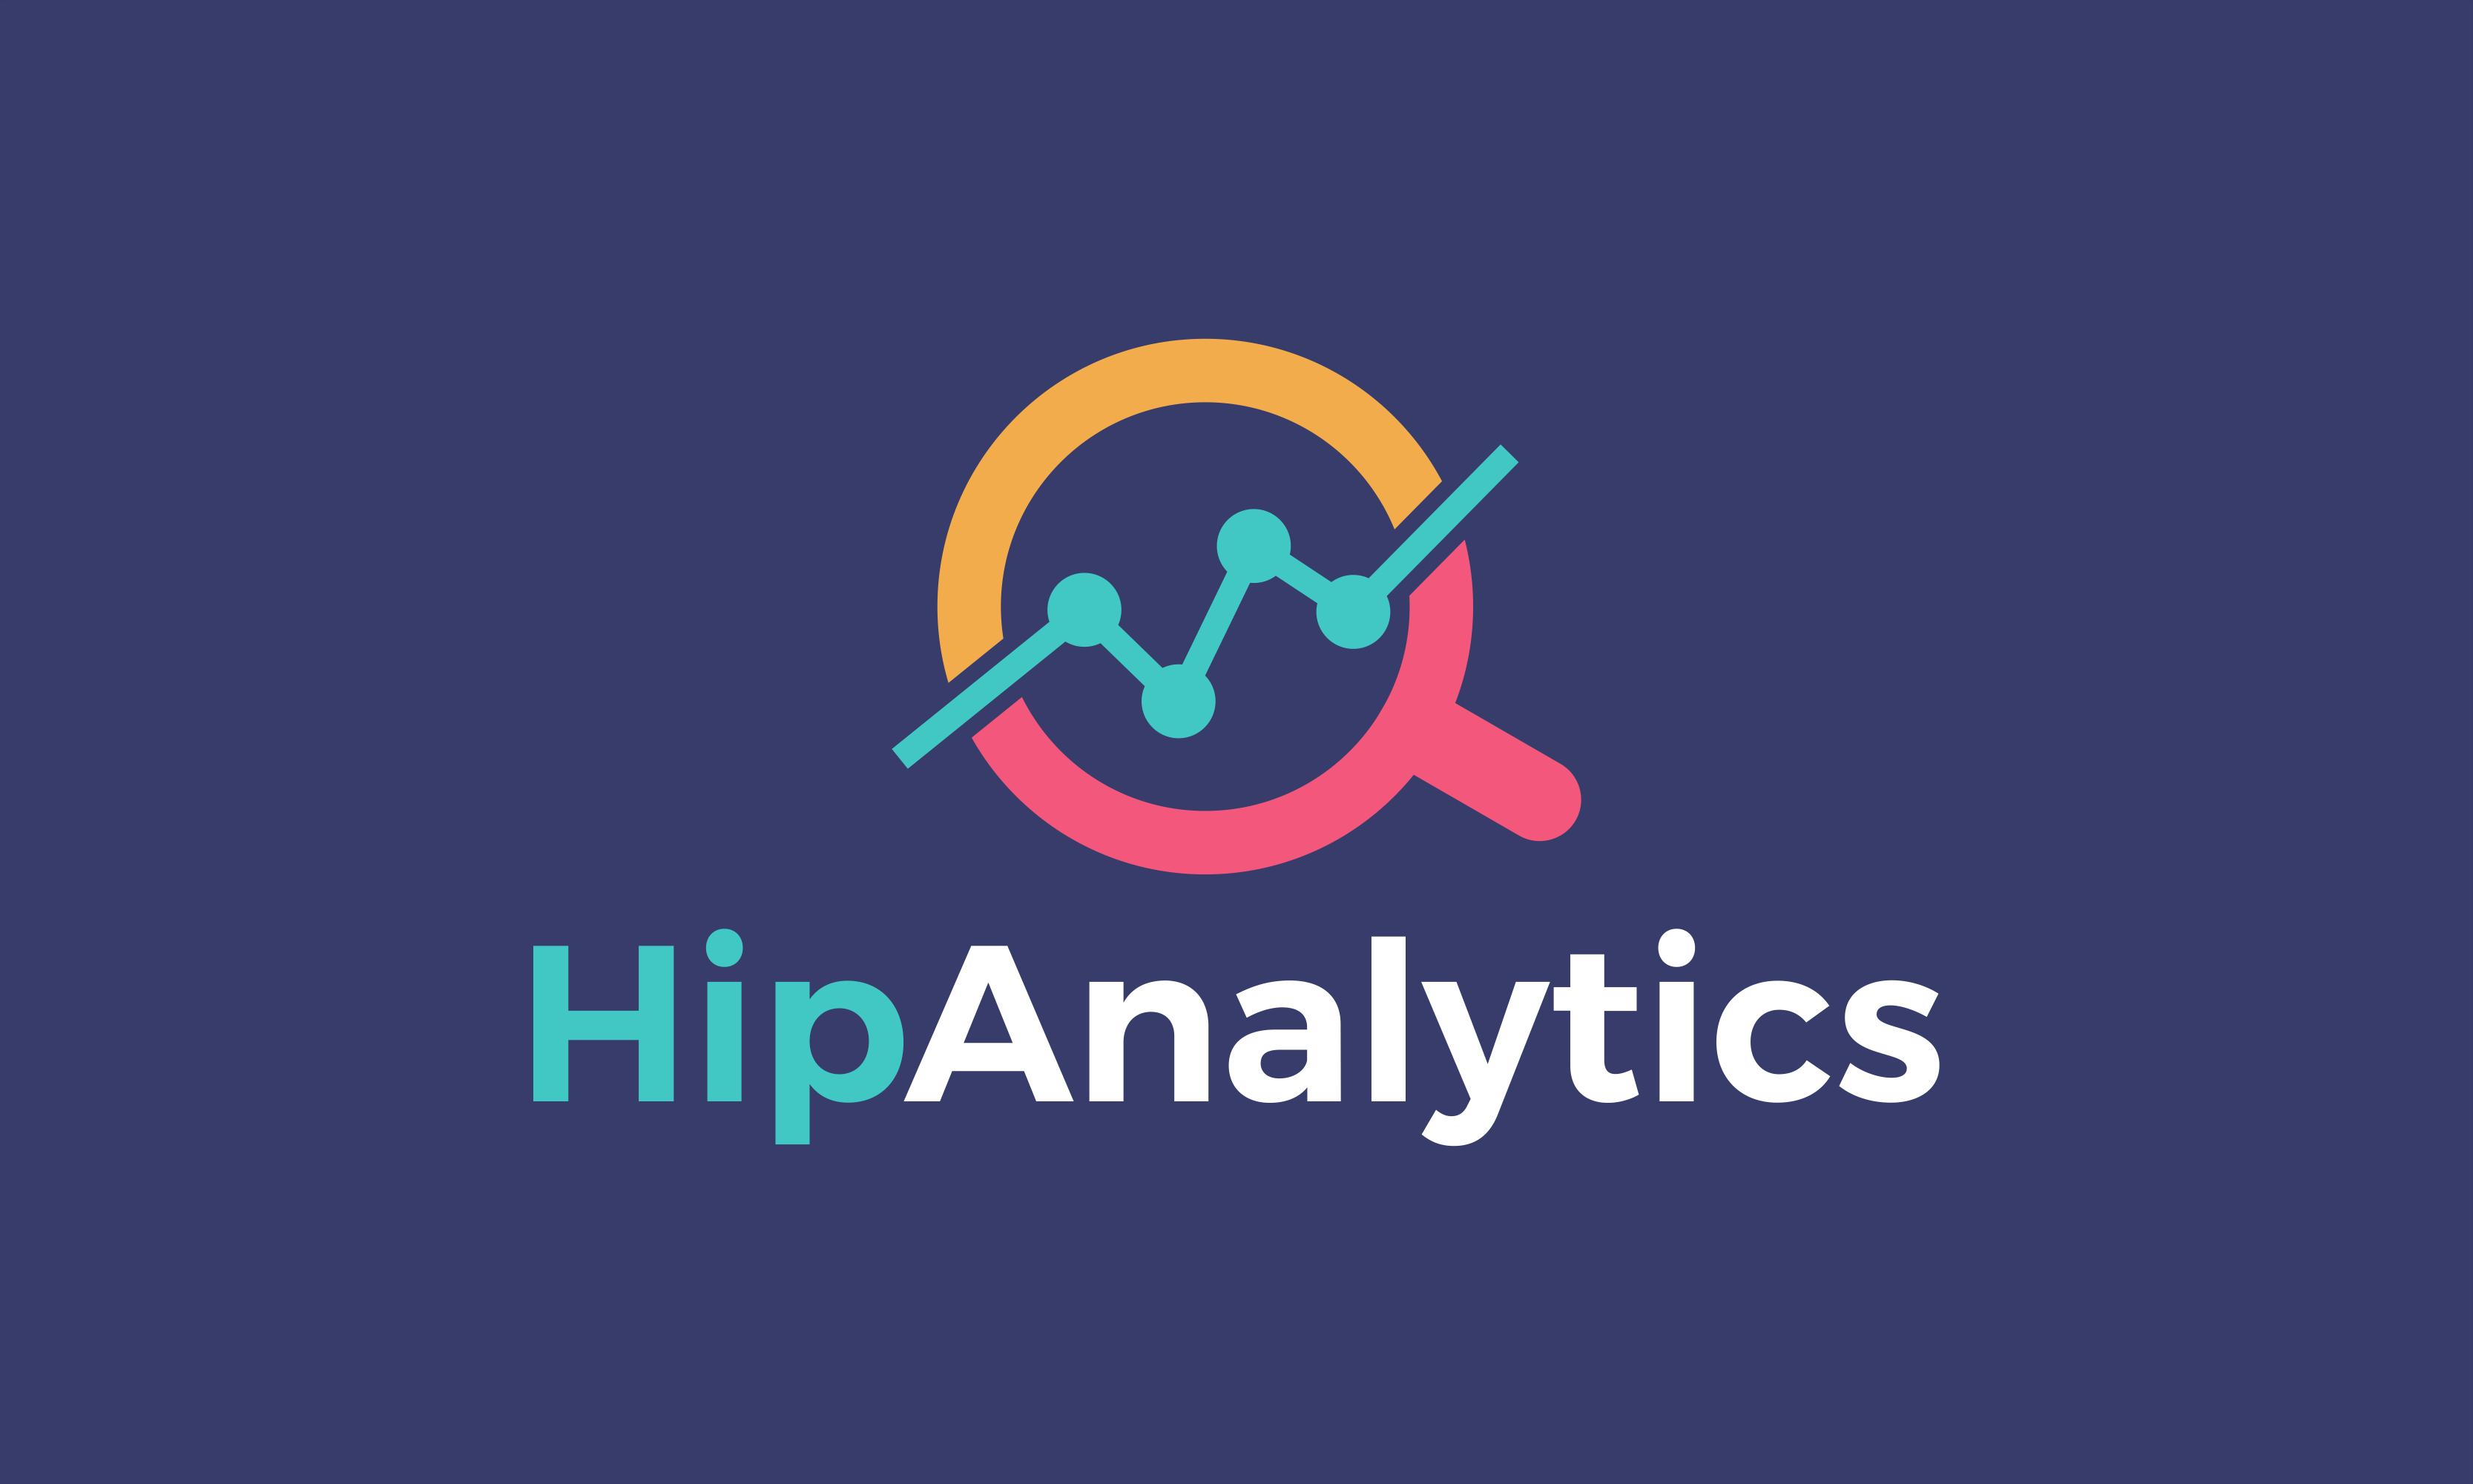 Hipanalytics